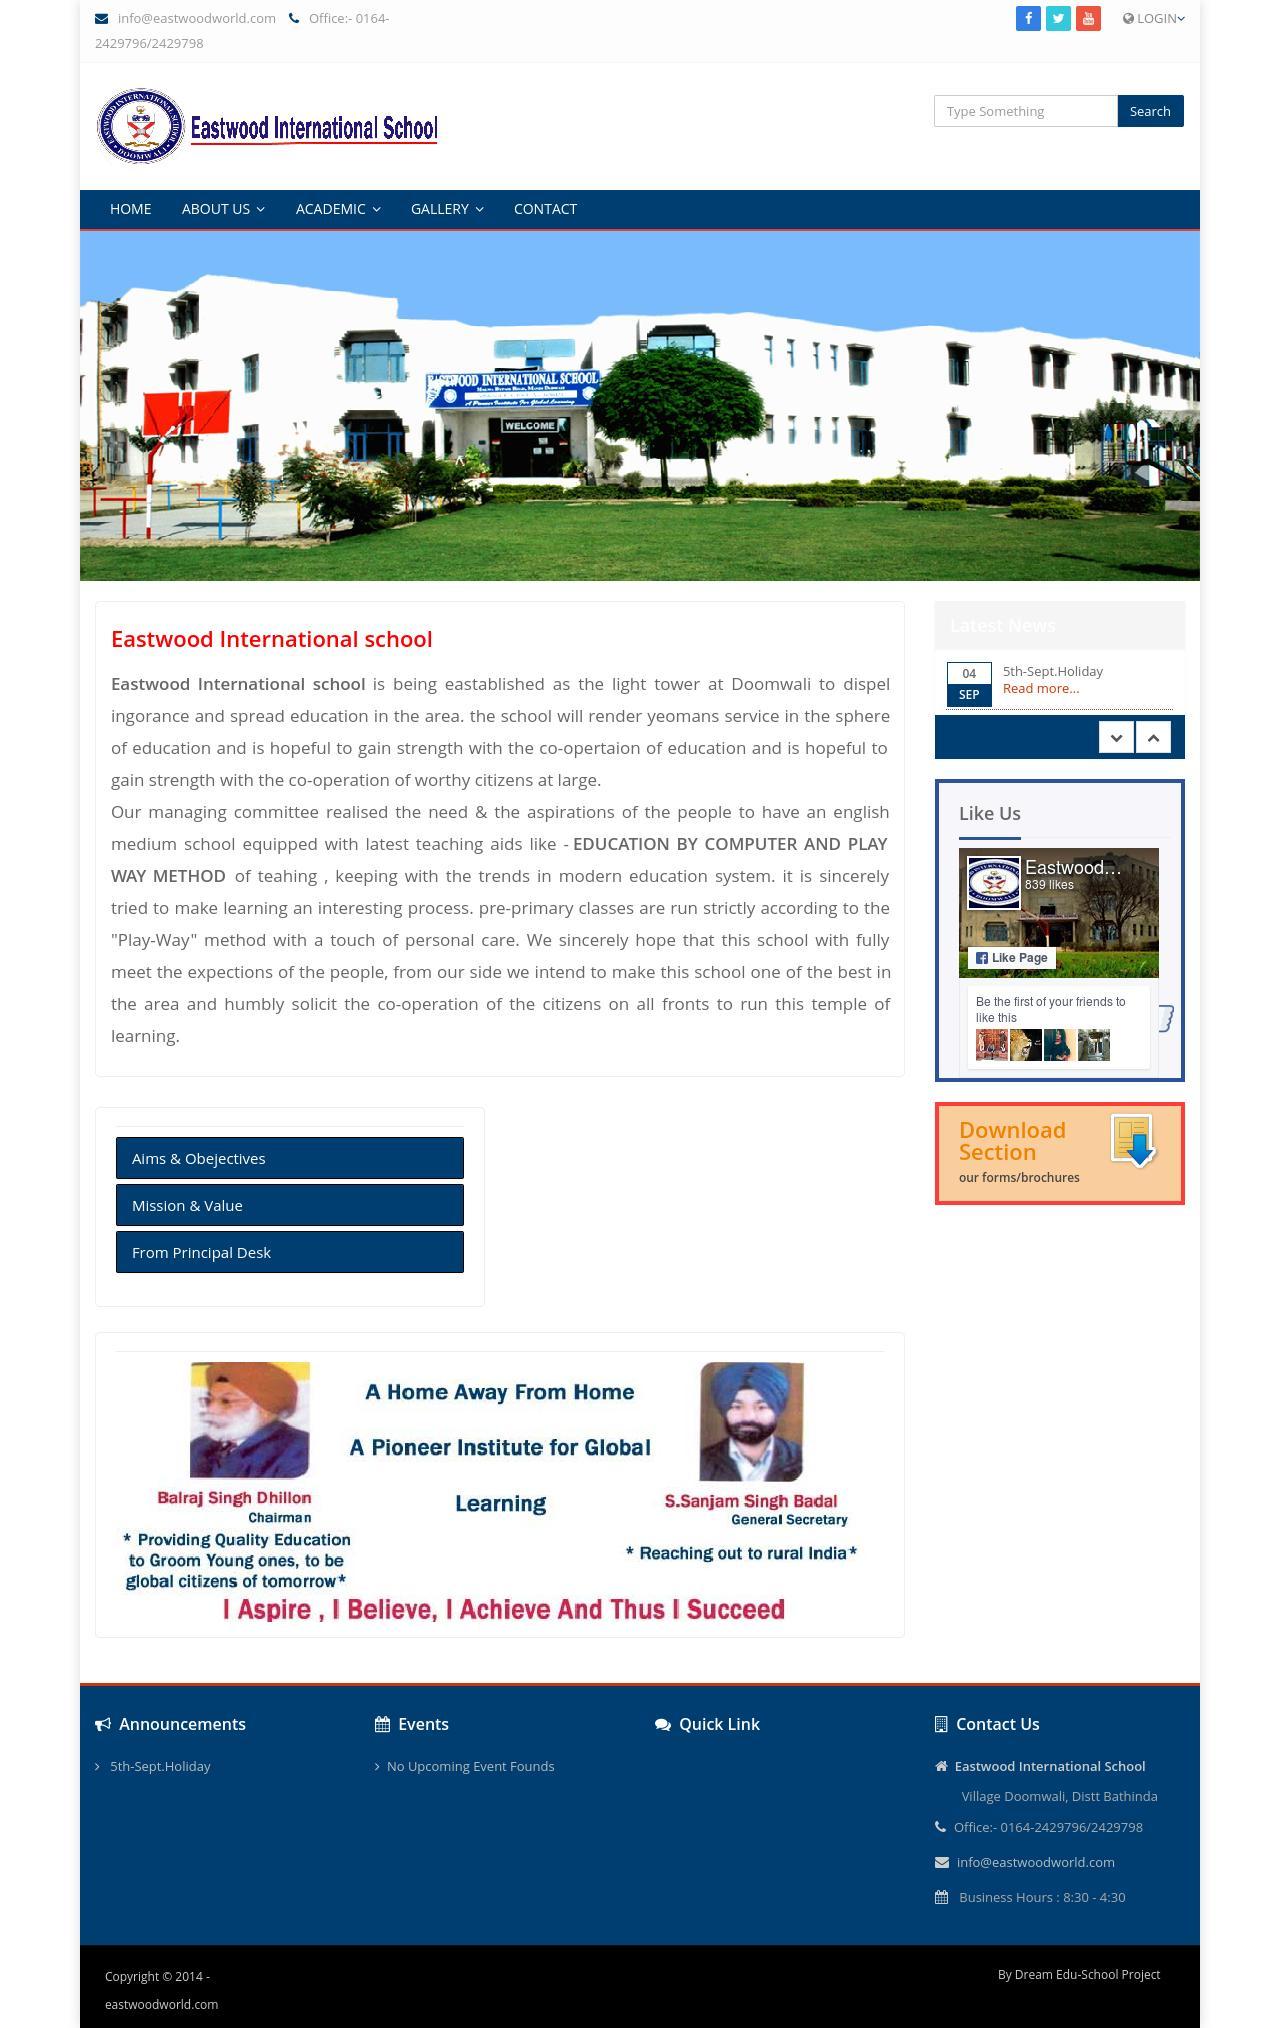 Eastwood International School